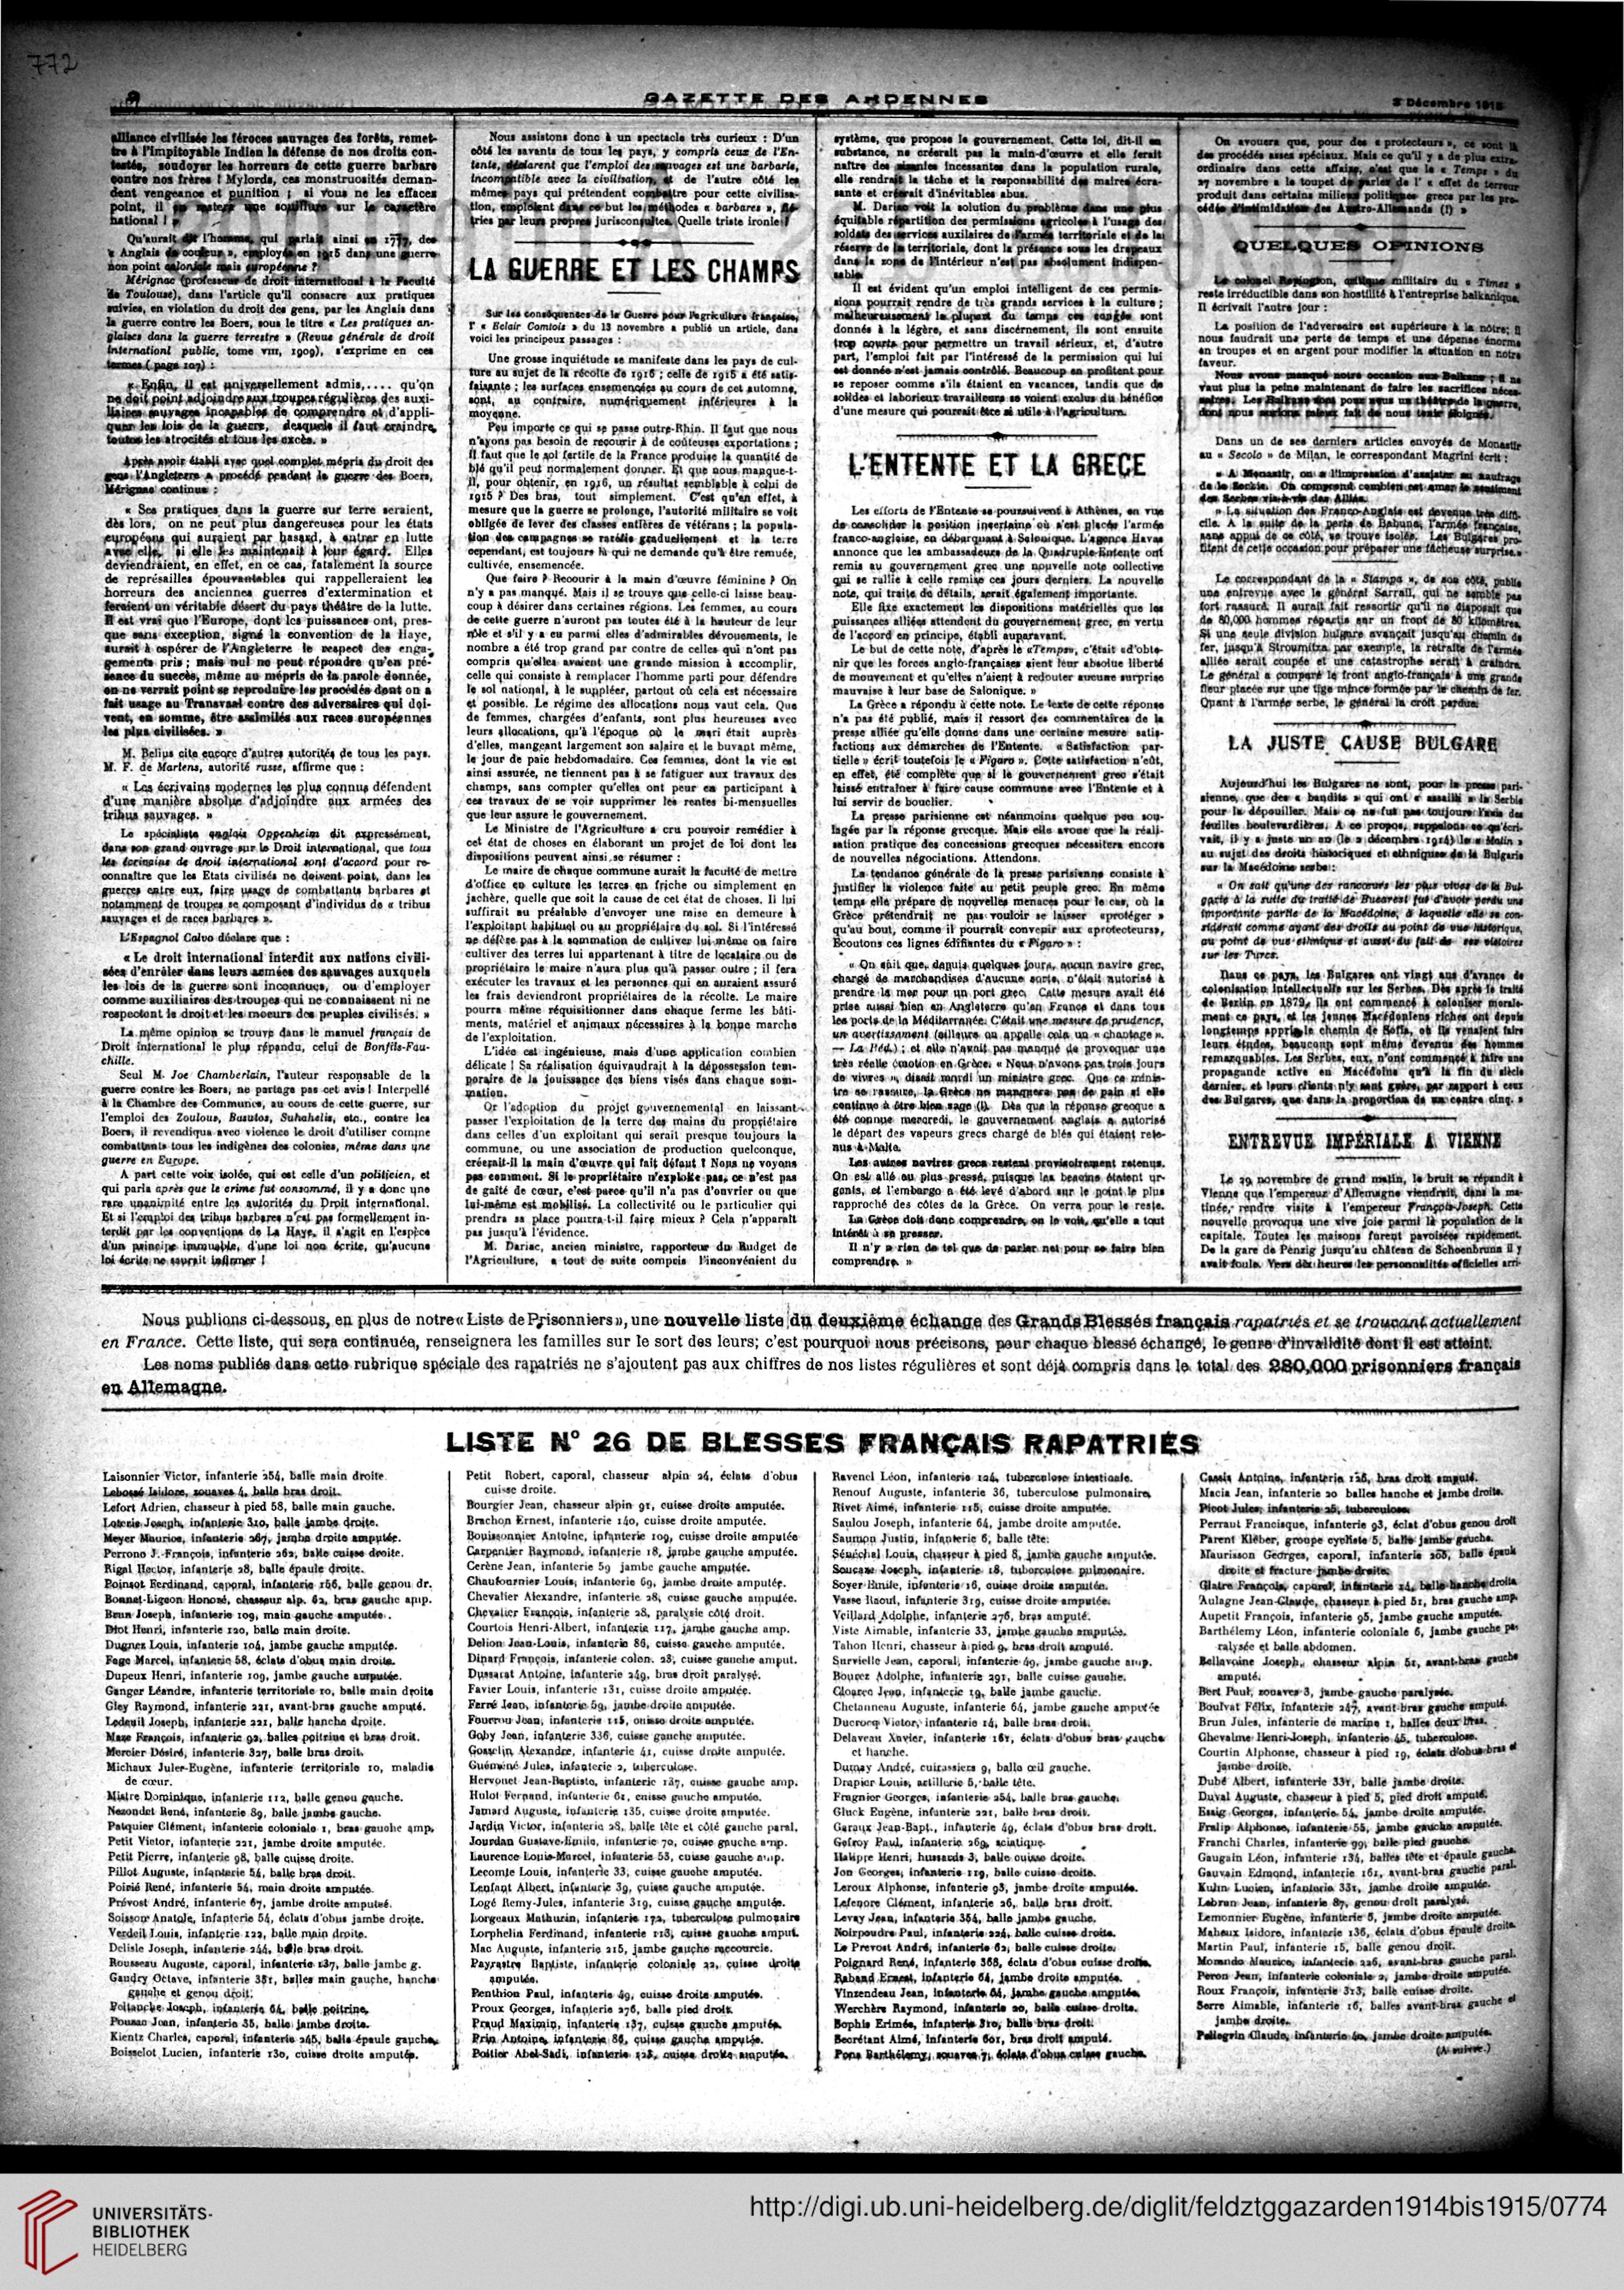 Gazette des Ardennes: journal des pays occupés (November 1914 ...